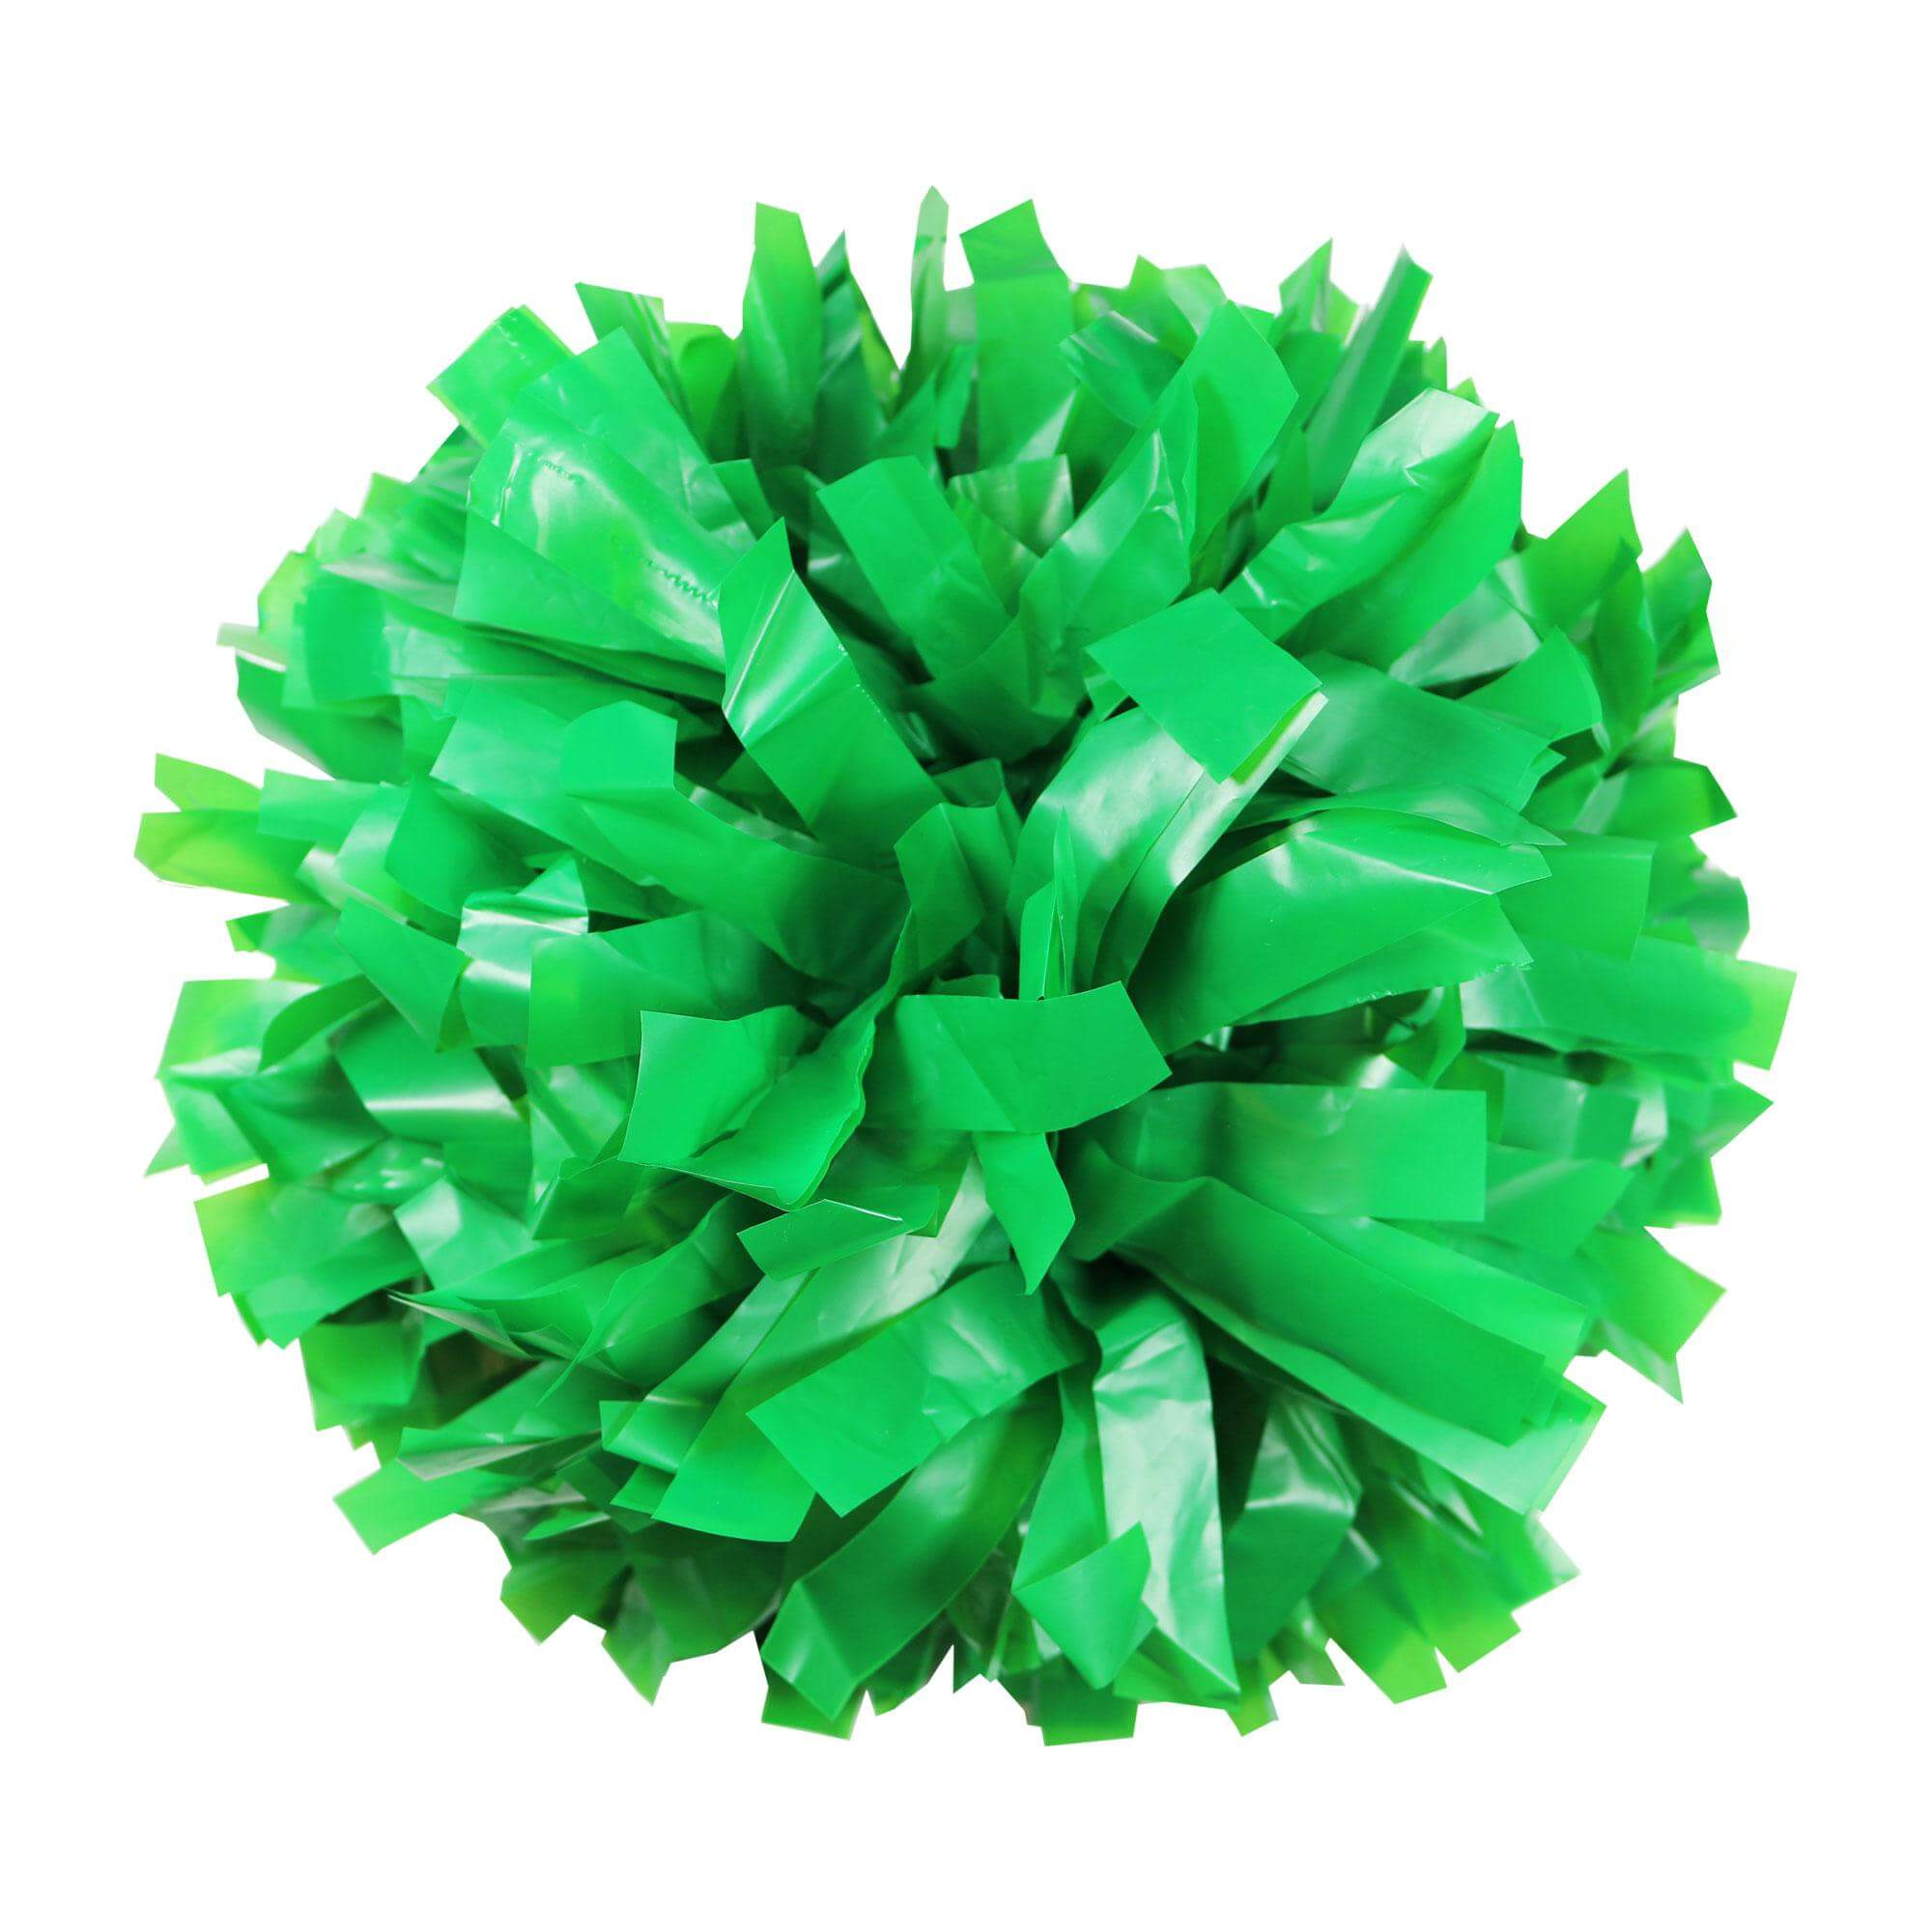 Danzcue Kelly Green Plastic Poms